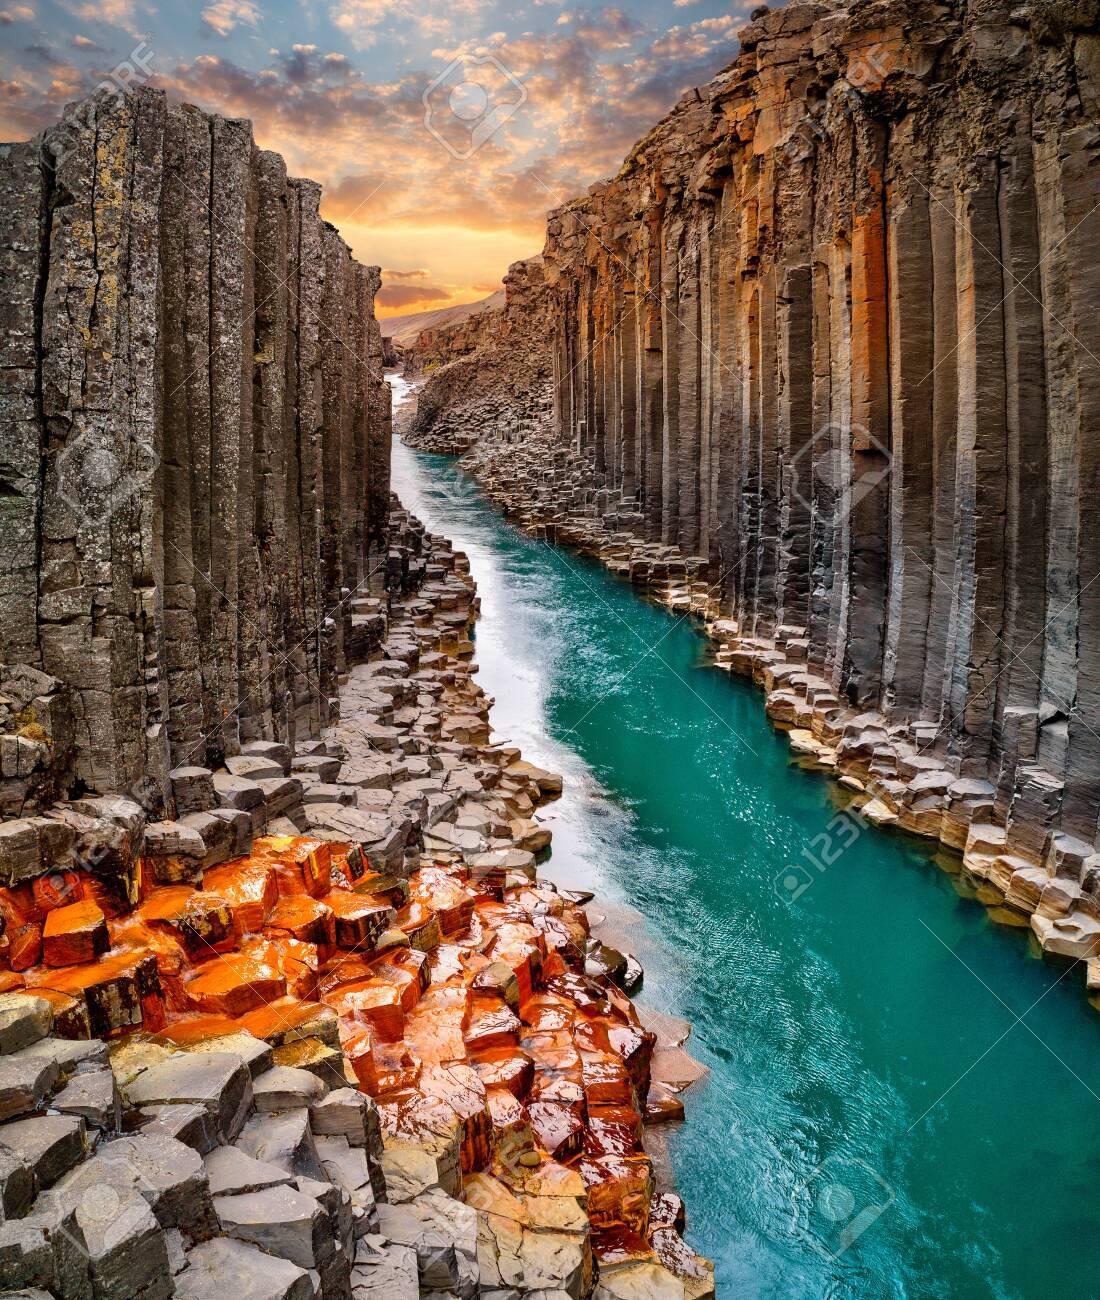 Breathtaking view of Studlagil basalt canyon, Iceland. - 127038898